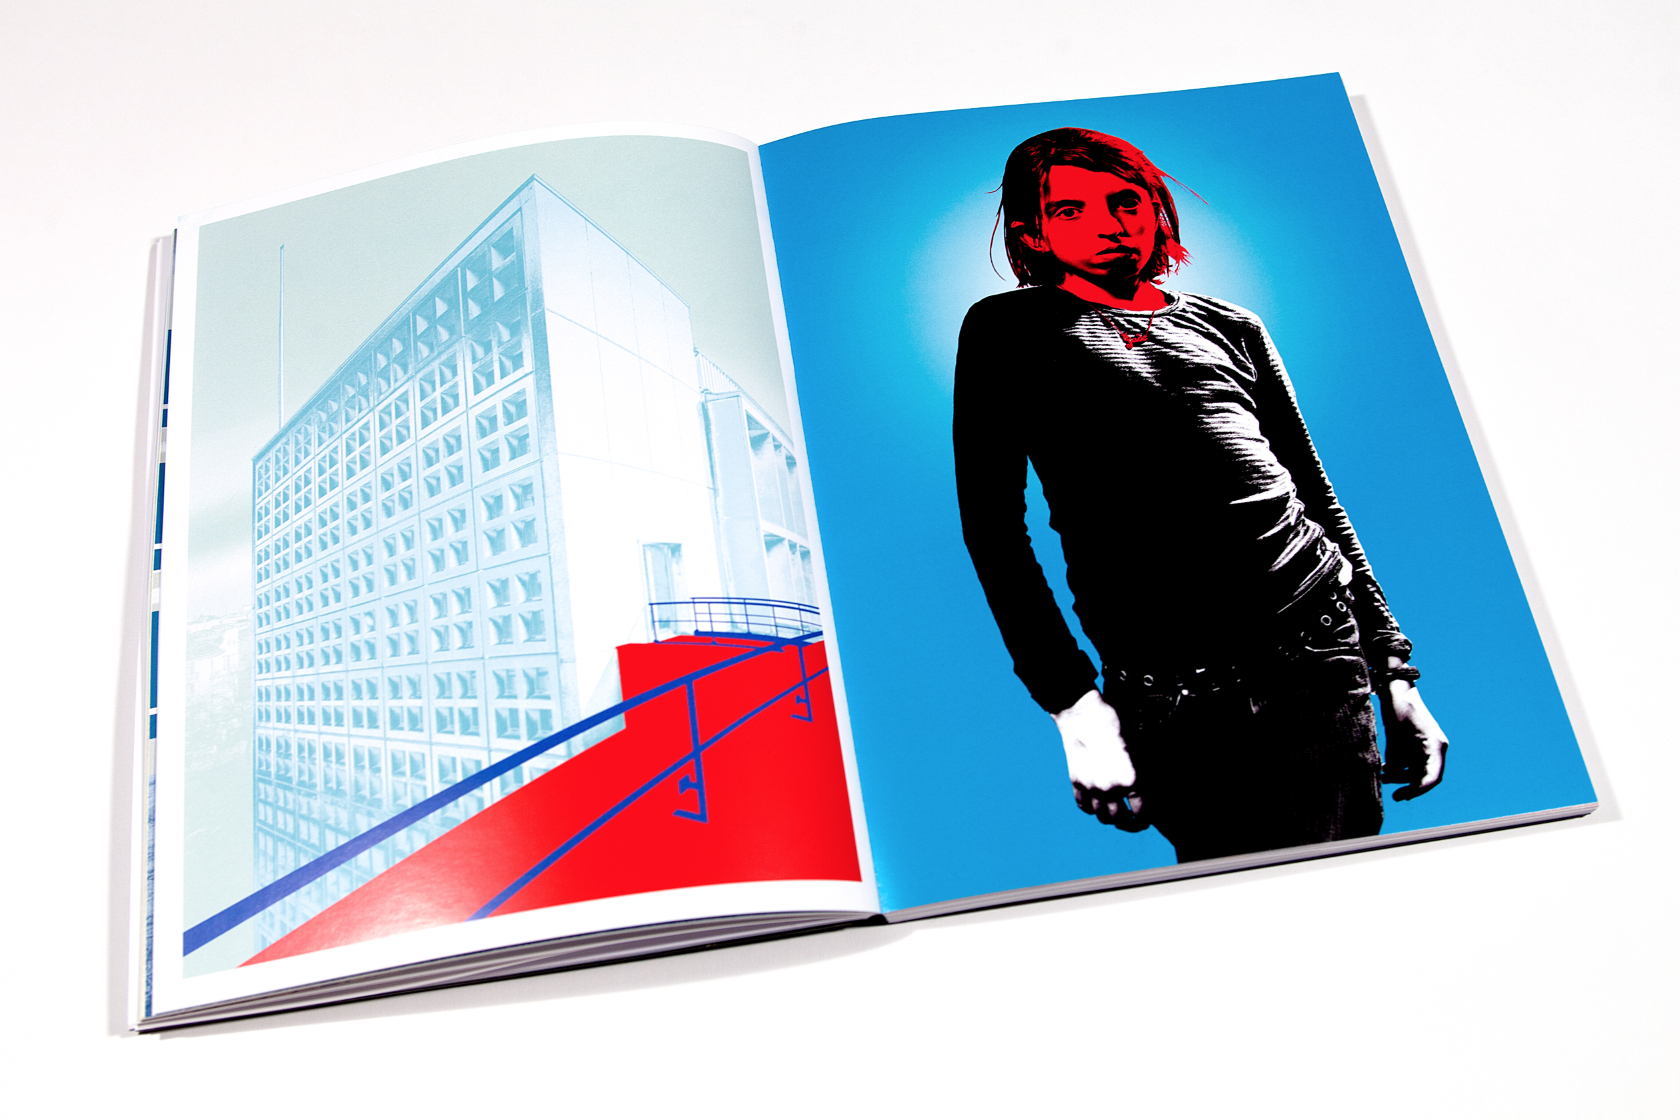 mauren_brodbeck_book_monograph_photography_05